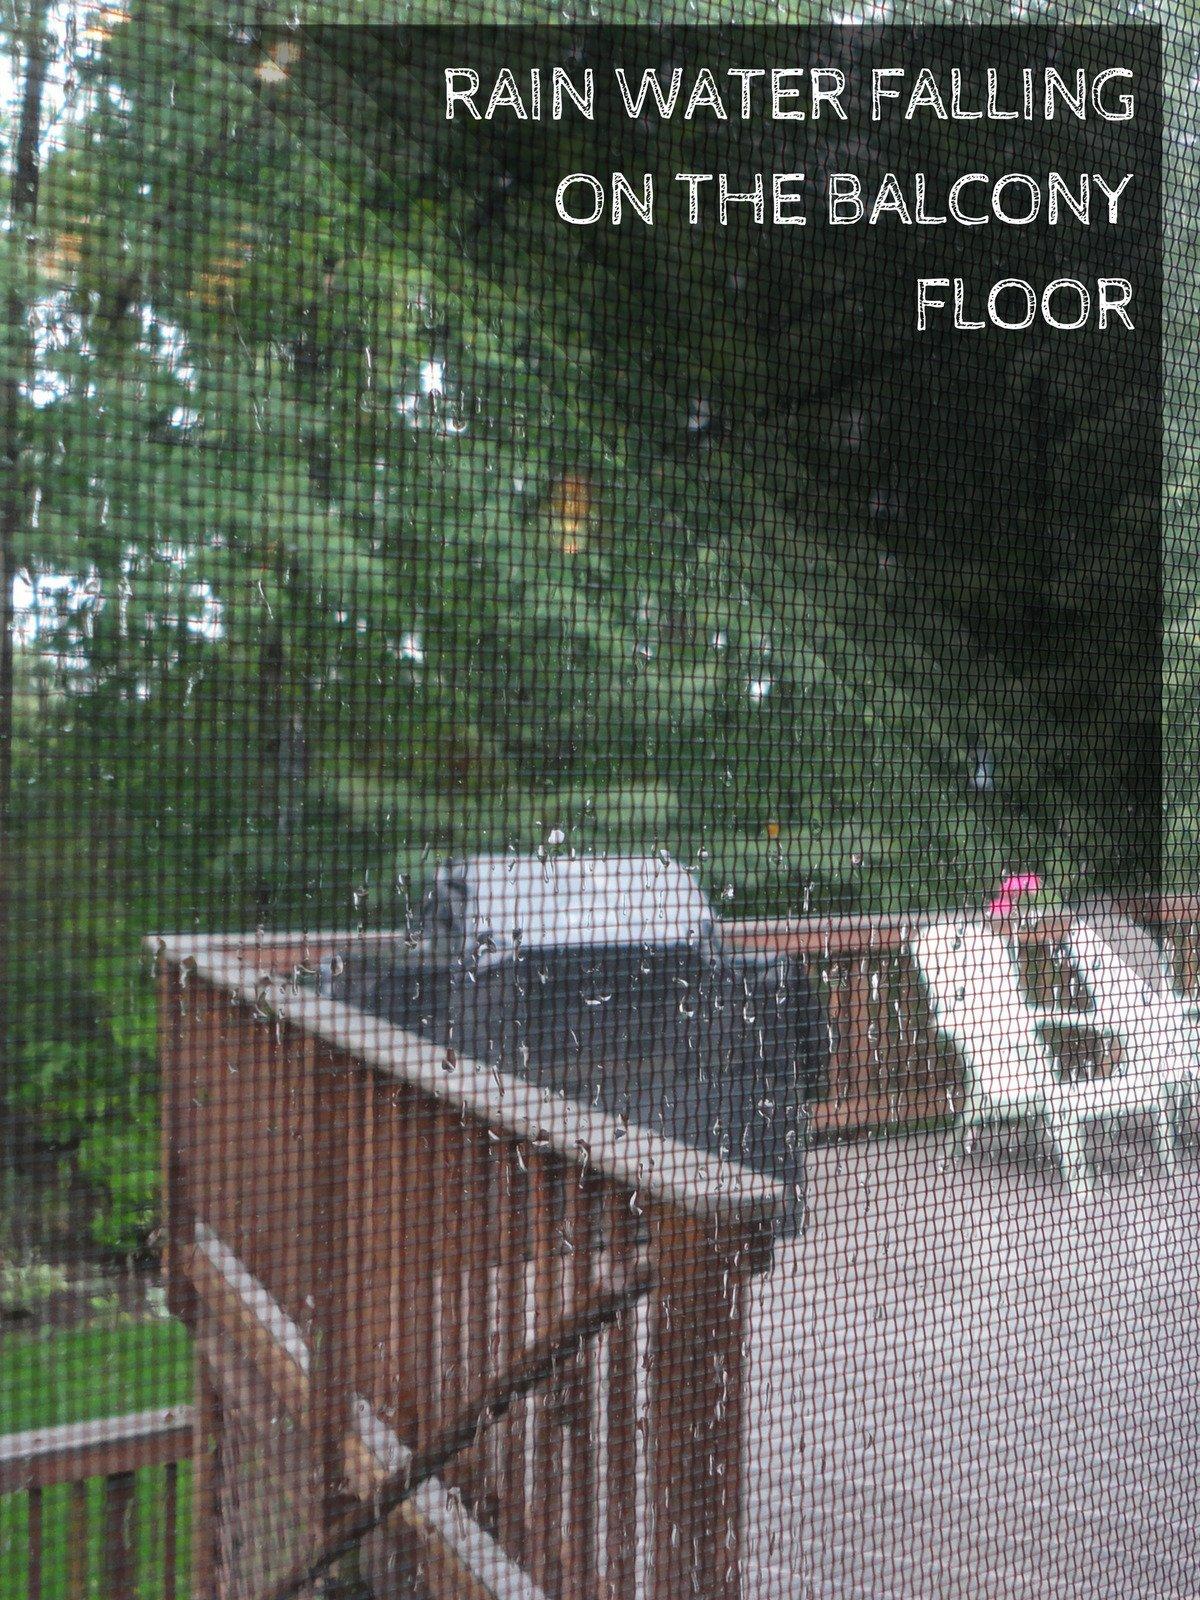 Rain water falling on the balcony floor